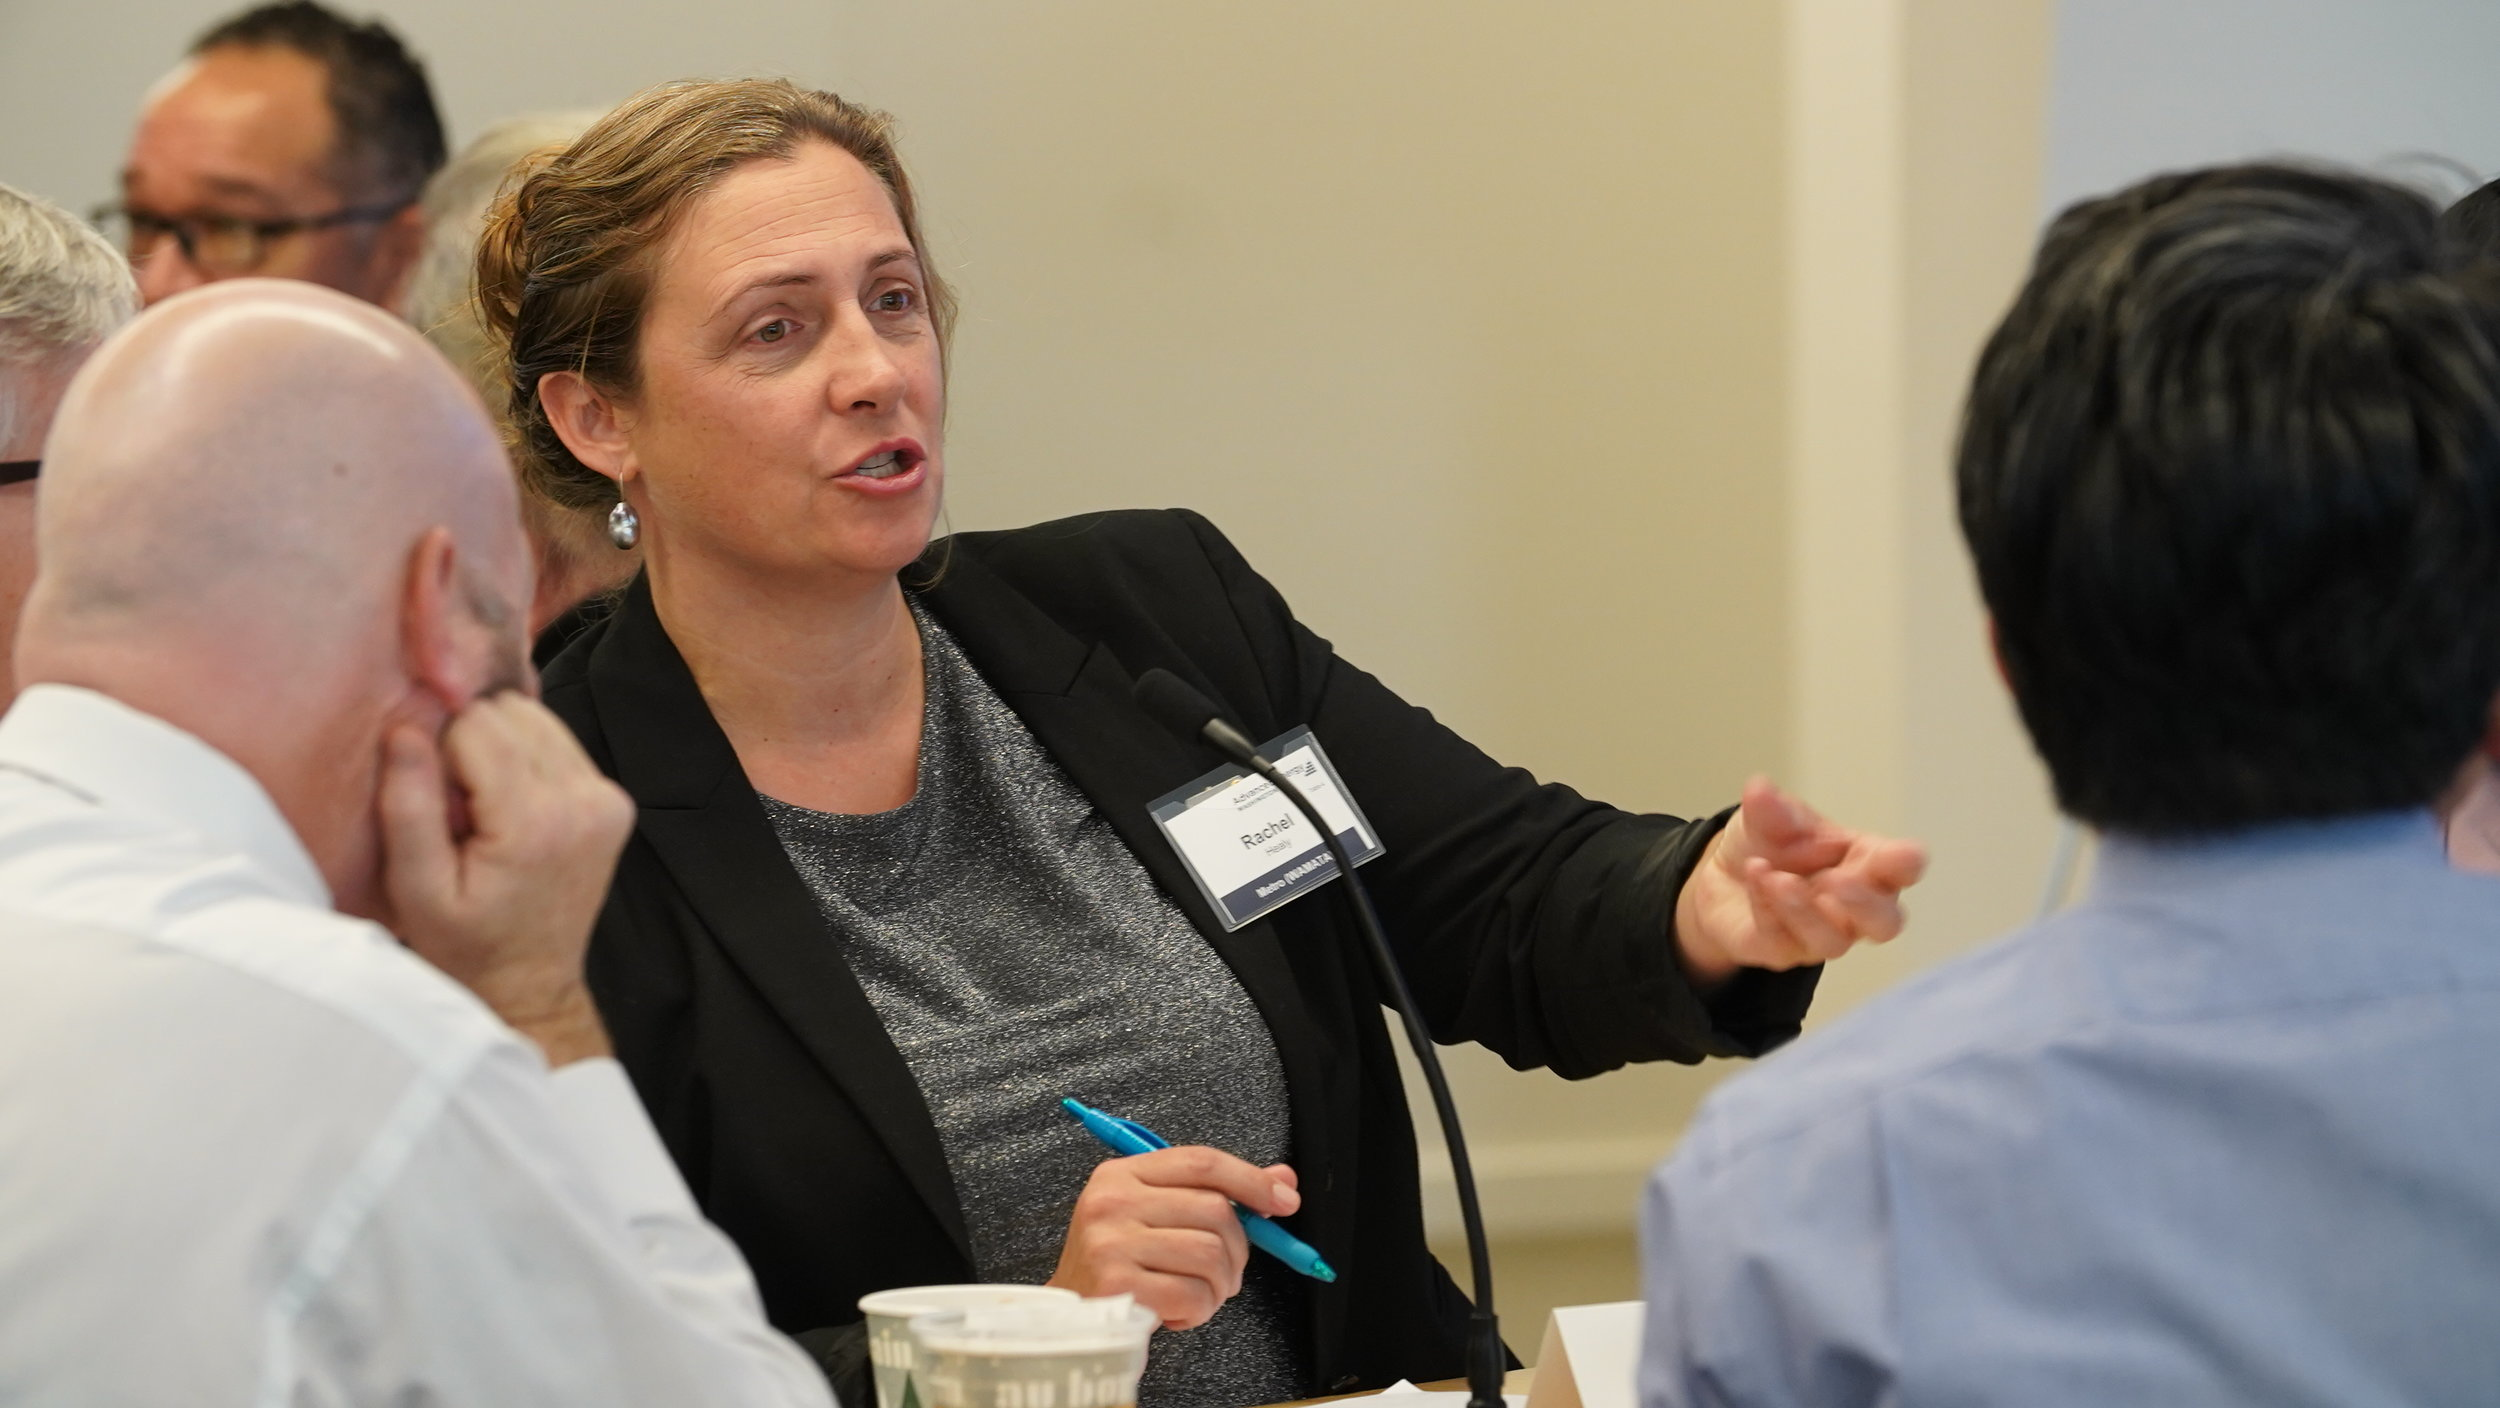 Rachel Healy, Sustainability Director, Washington Metropolitan Area Transit Authority (WMATA)